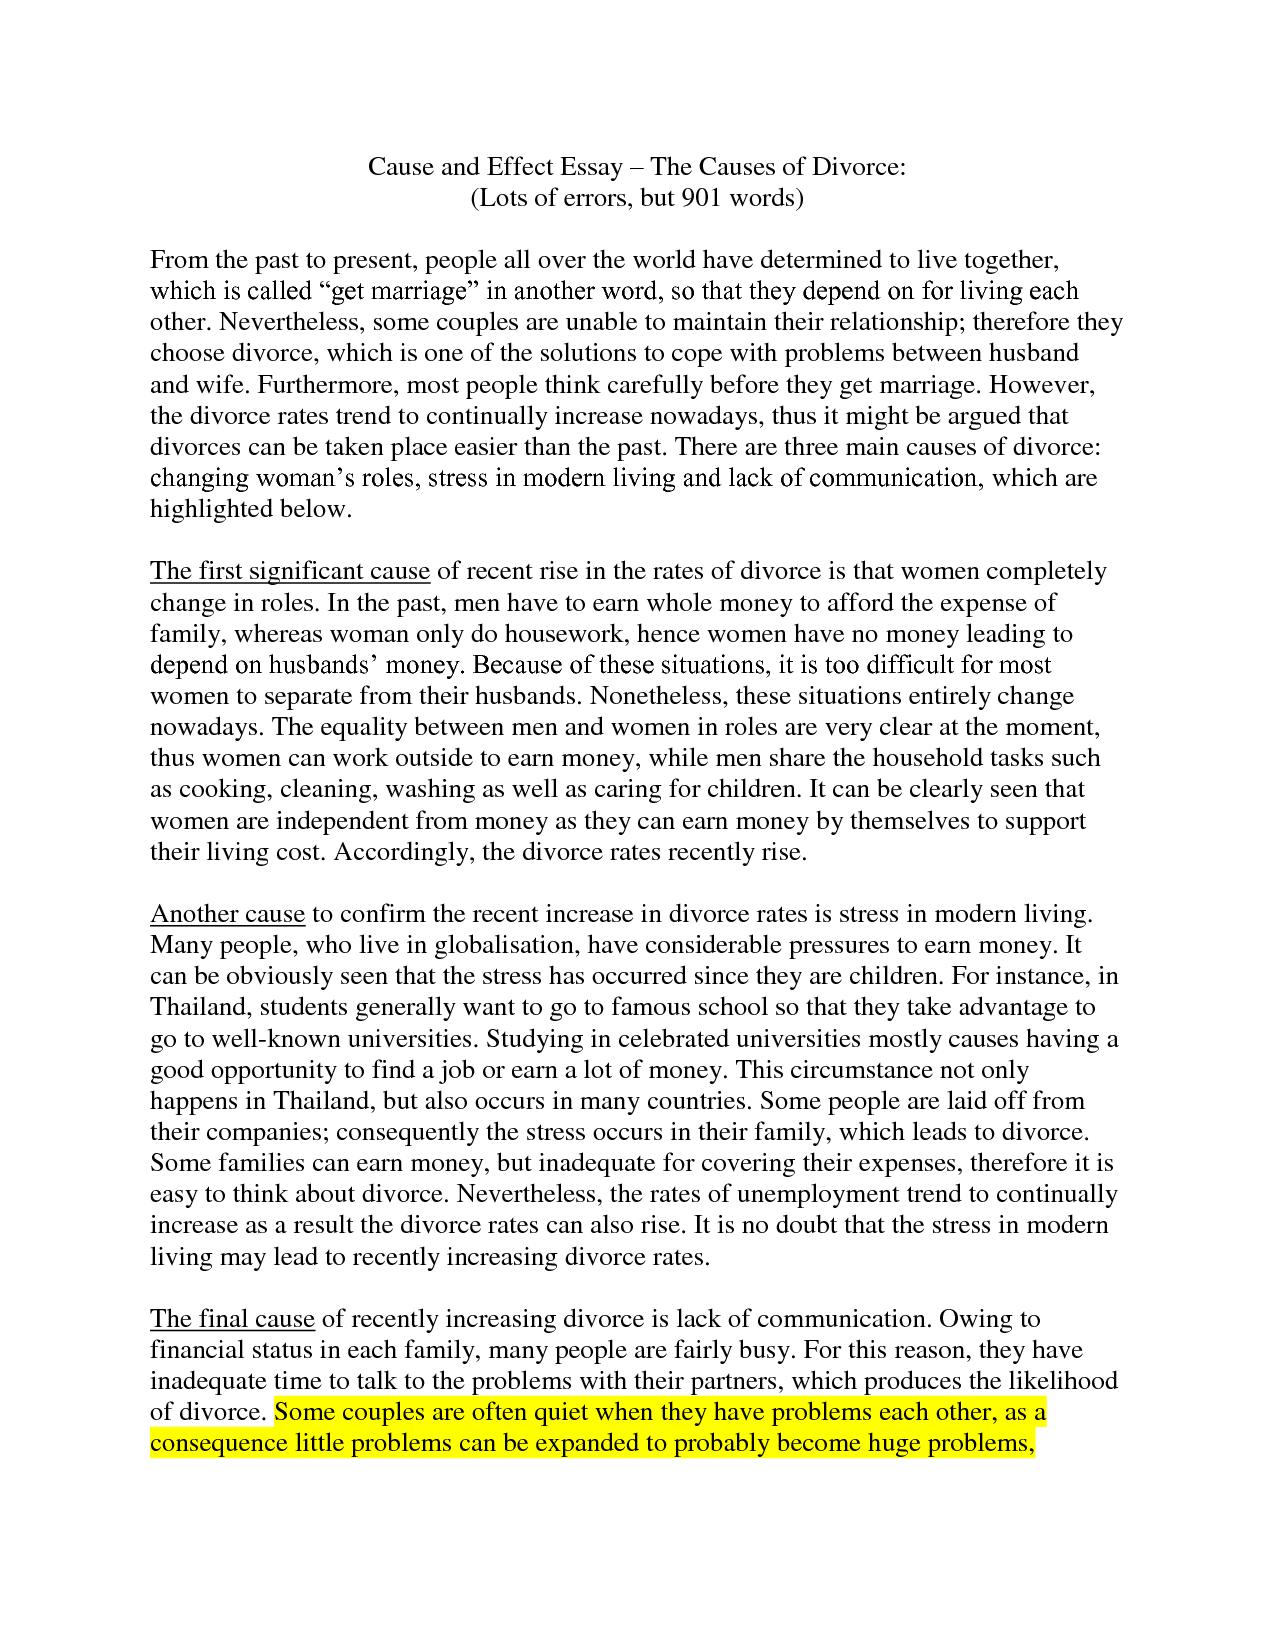 2010 British Petroleum Gulf Oil Spill coursework writing